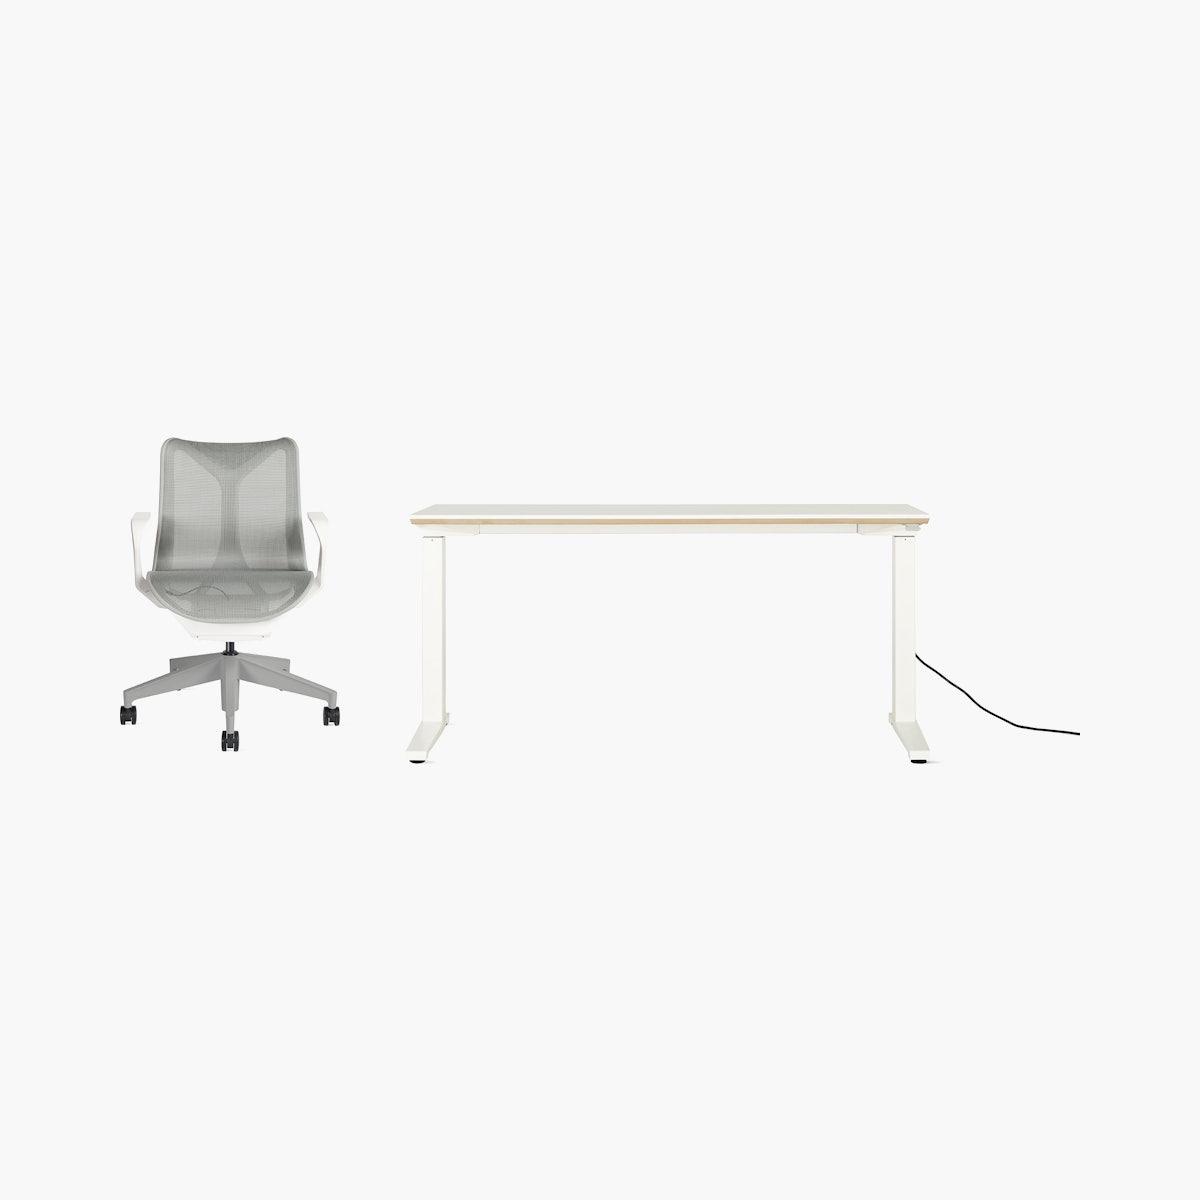 Cosm Chair / Renew Desk Office Bundle